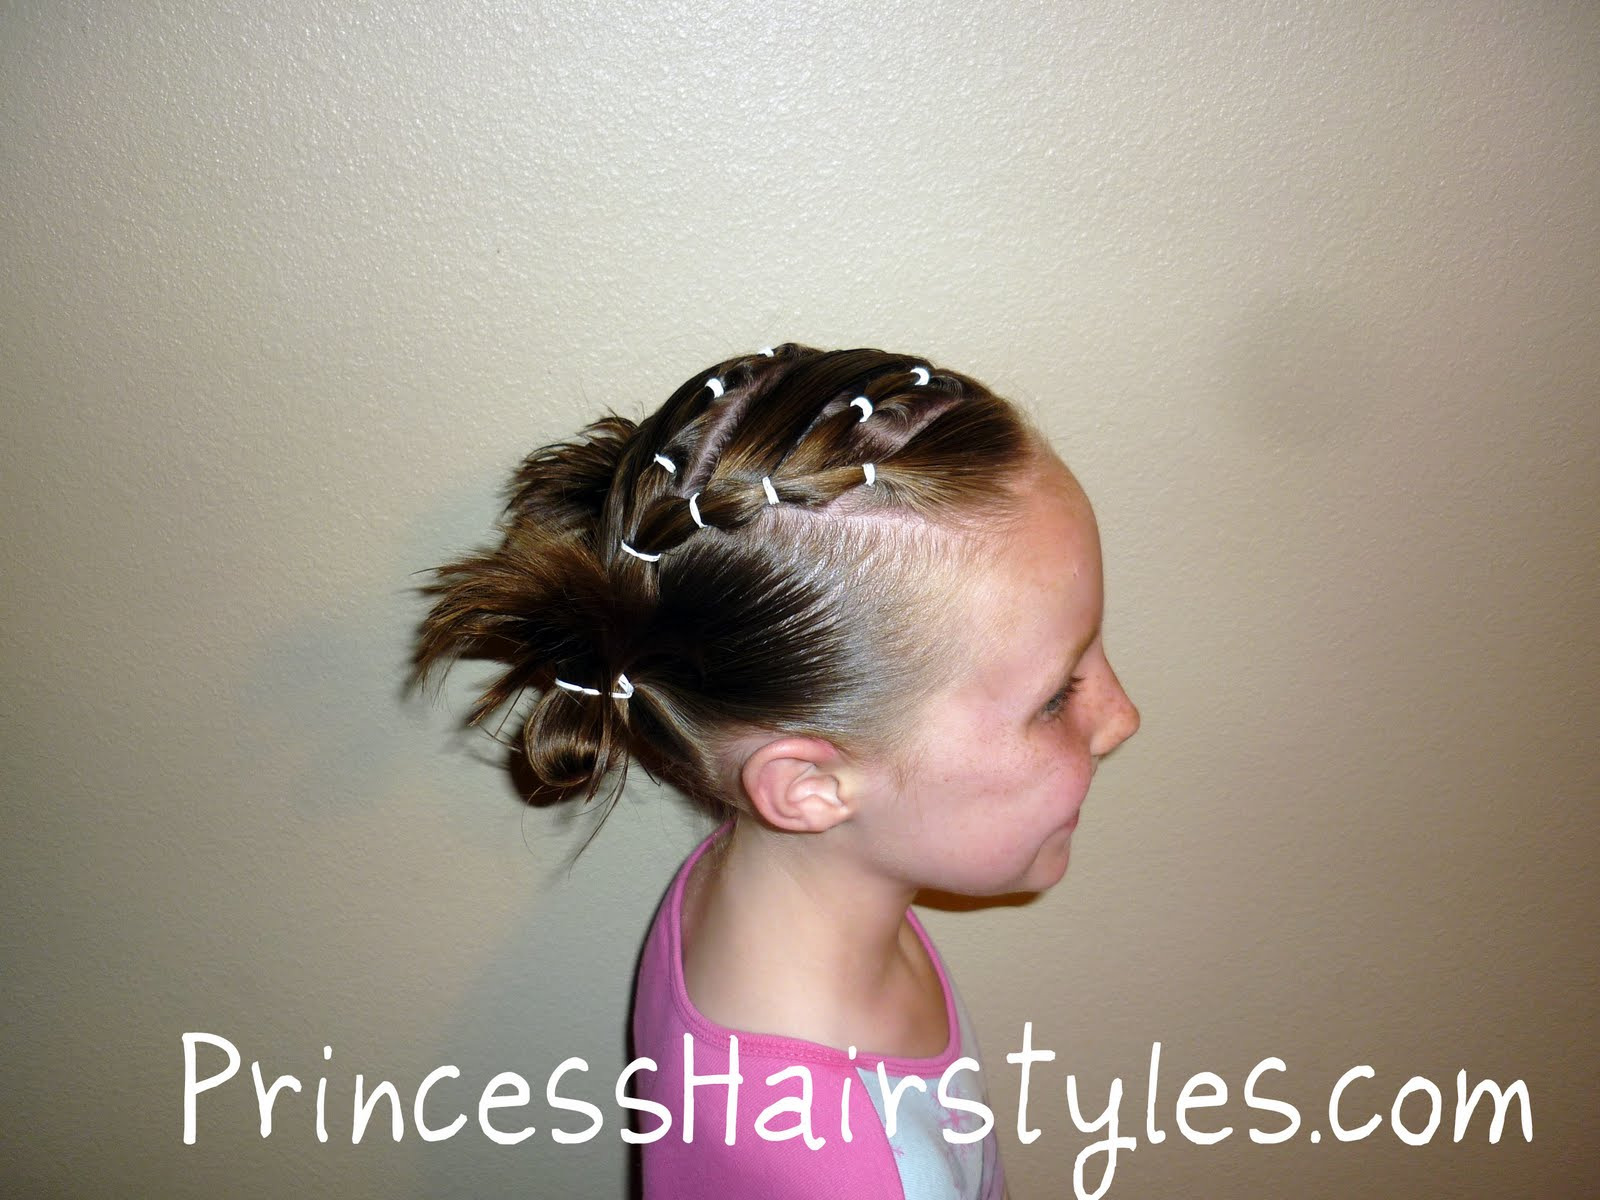 Awe Inspiring Chutes And Ladders Hairdo Hairstyles For Girls Princess Hairstyles Short Hairstyles For Black Women Fulllsitofus